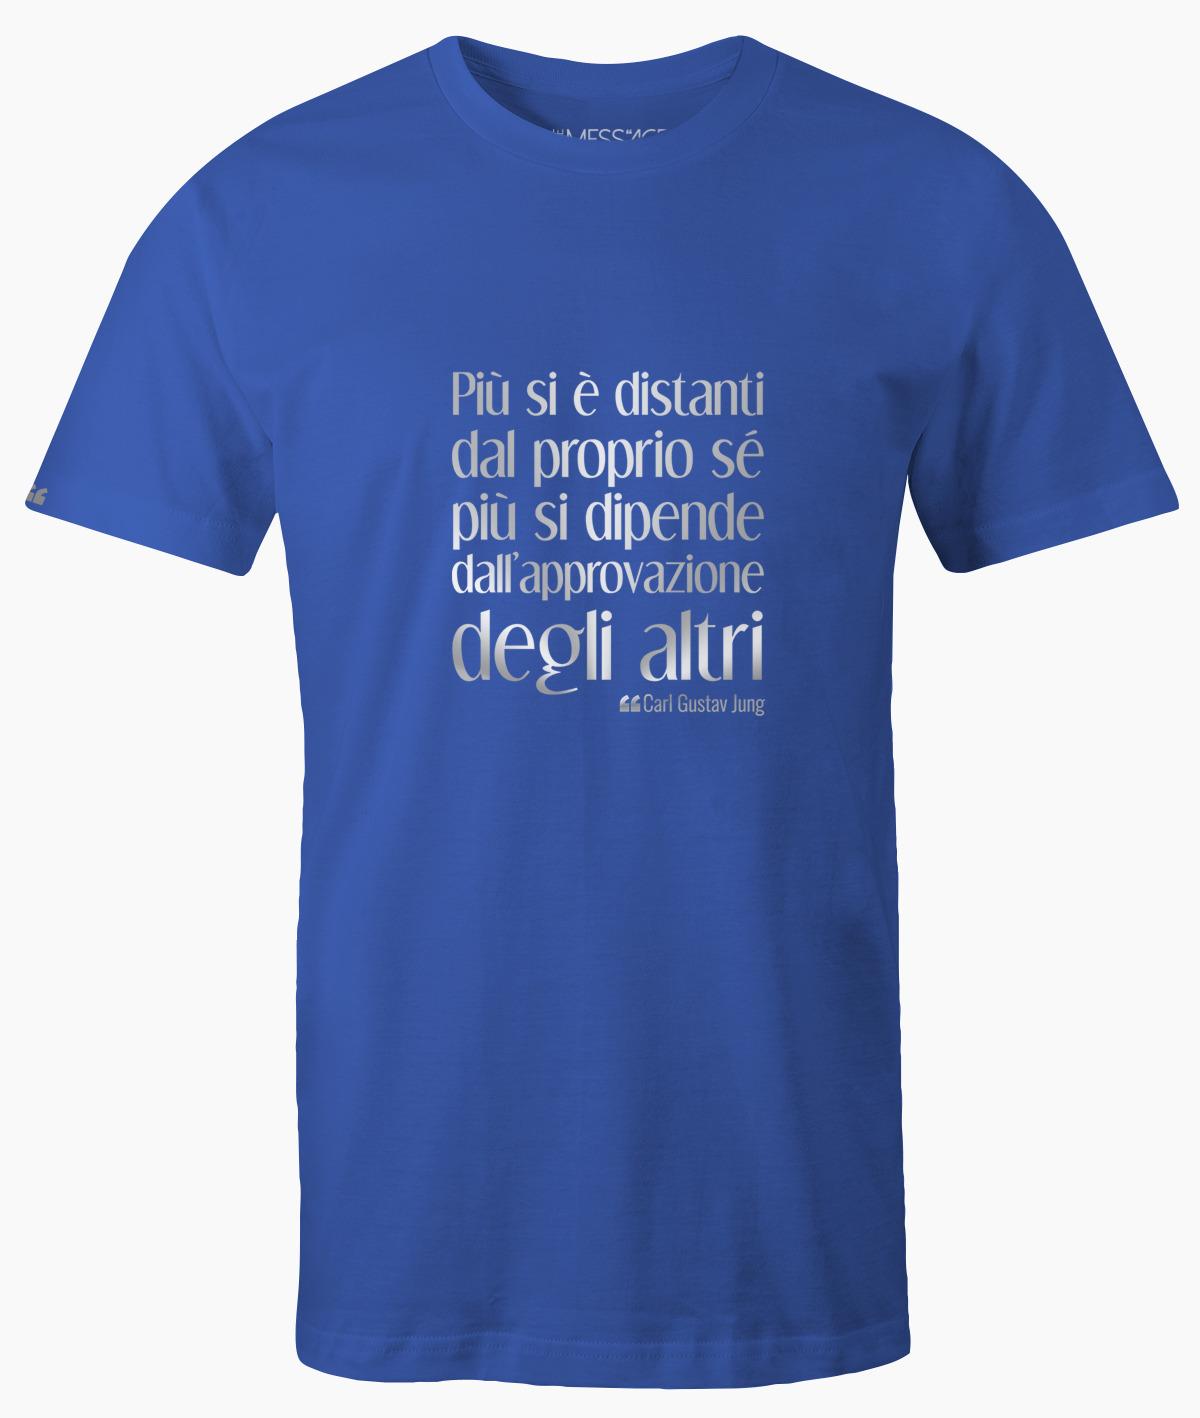 Più si è distanti dal proprio sé – Carl Gustav Jung T-Shirt